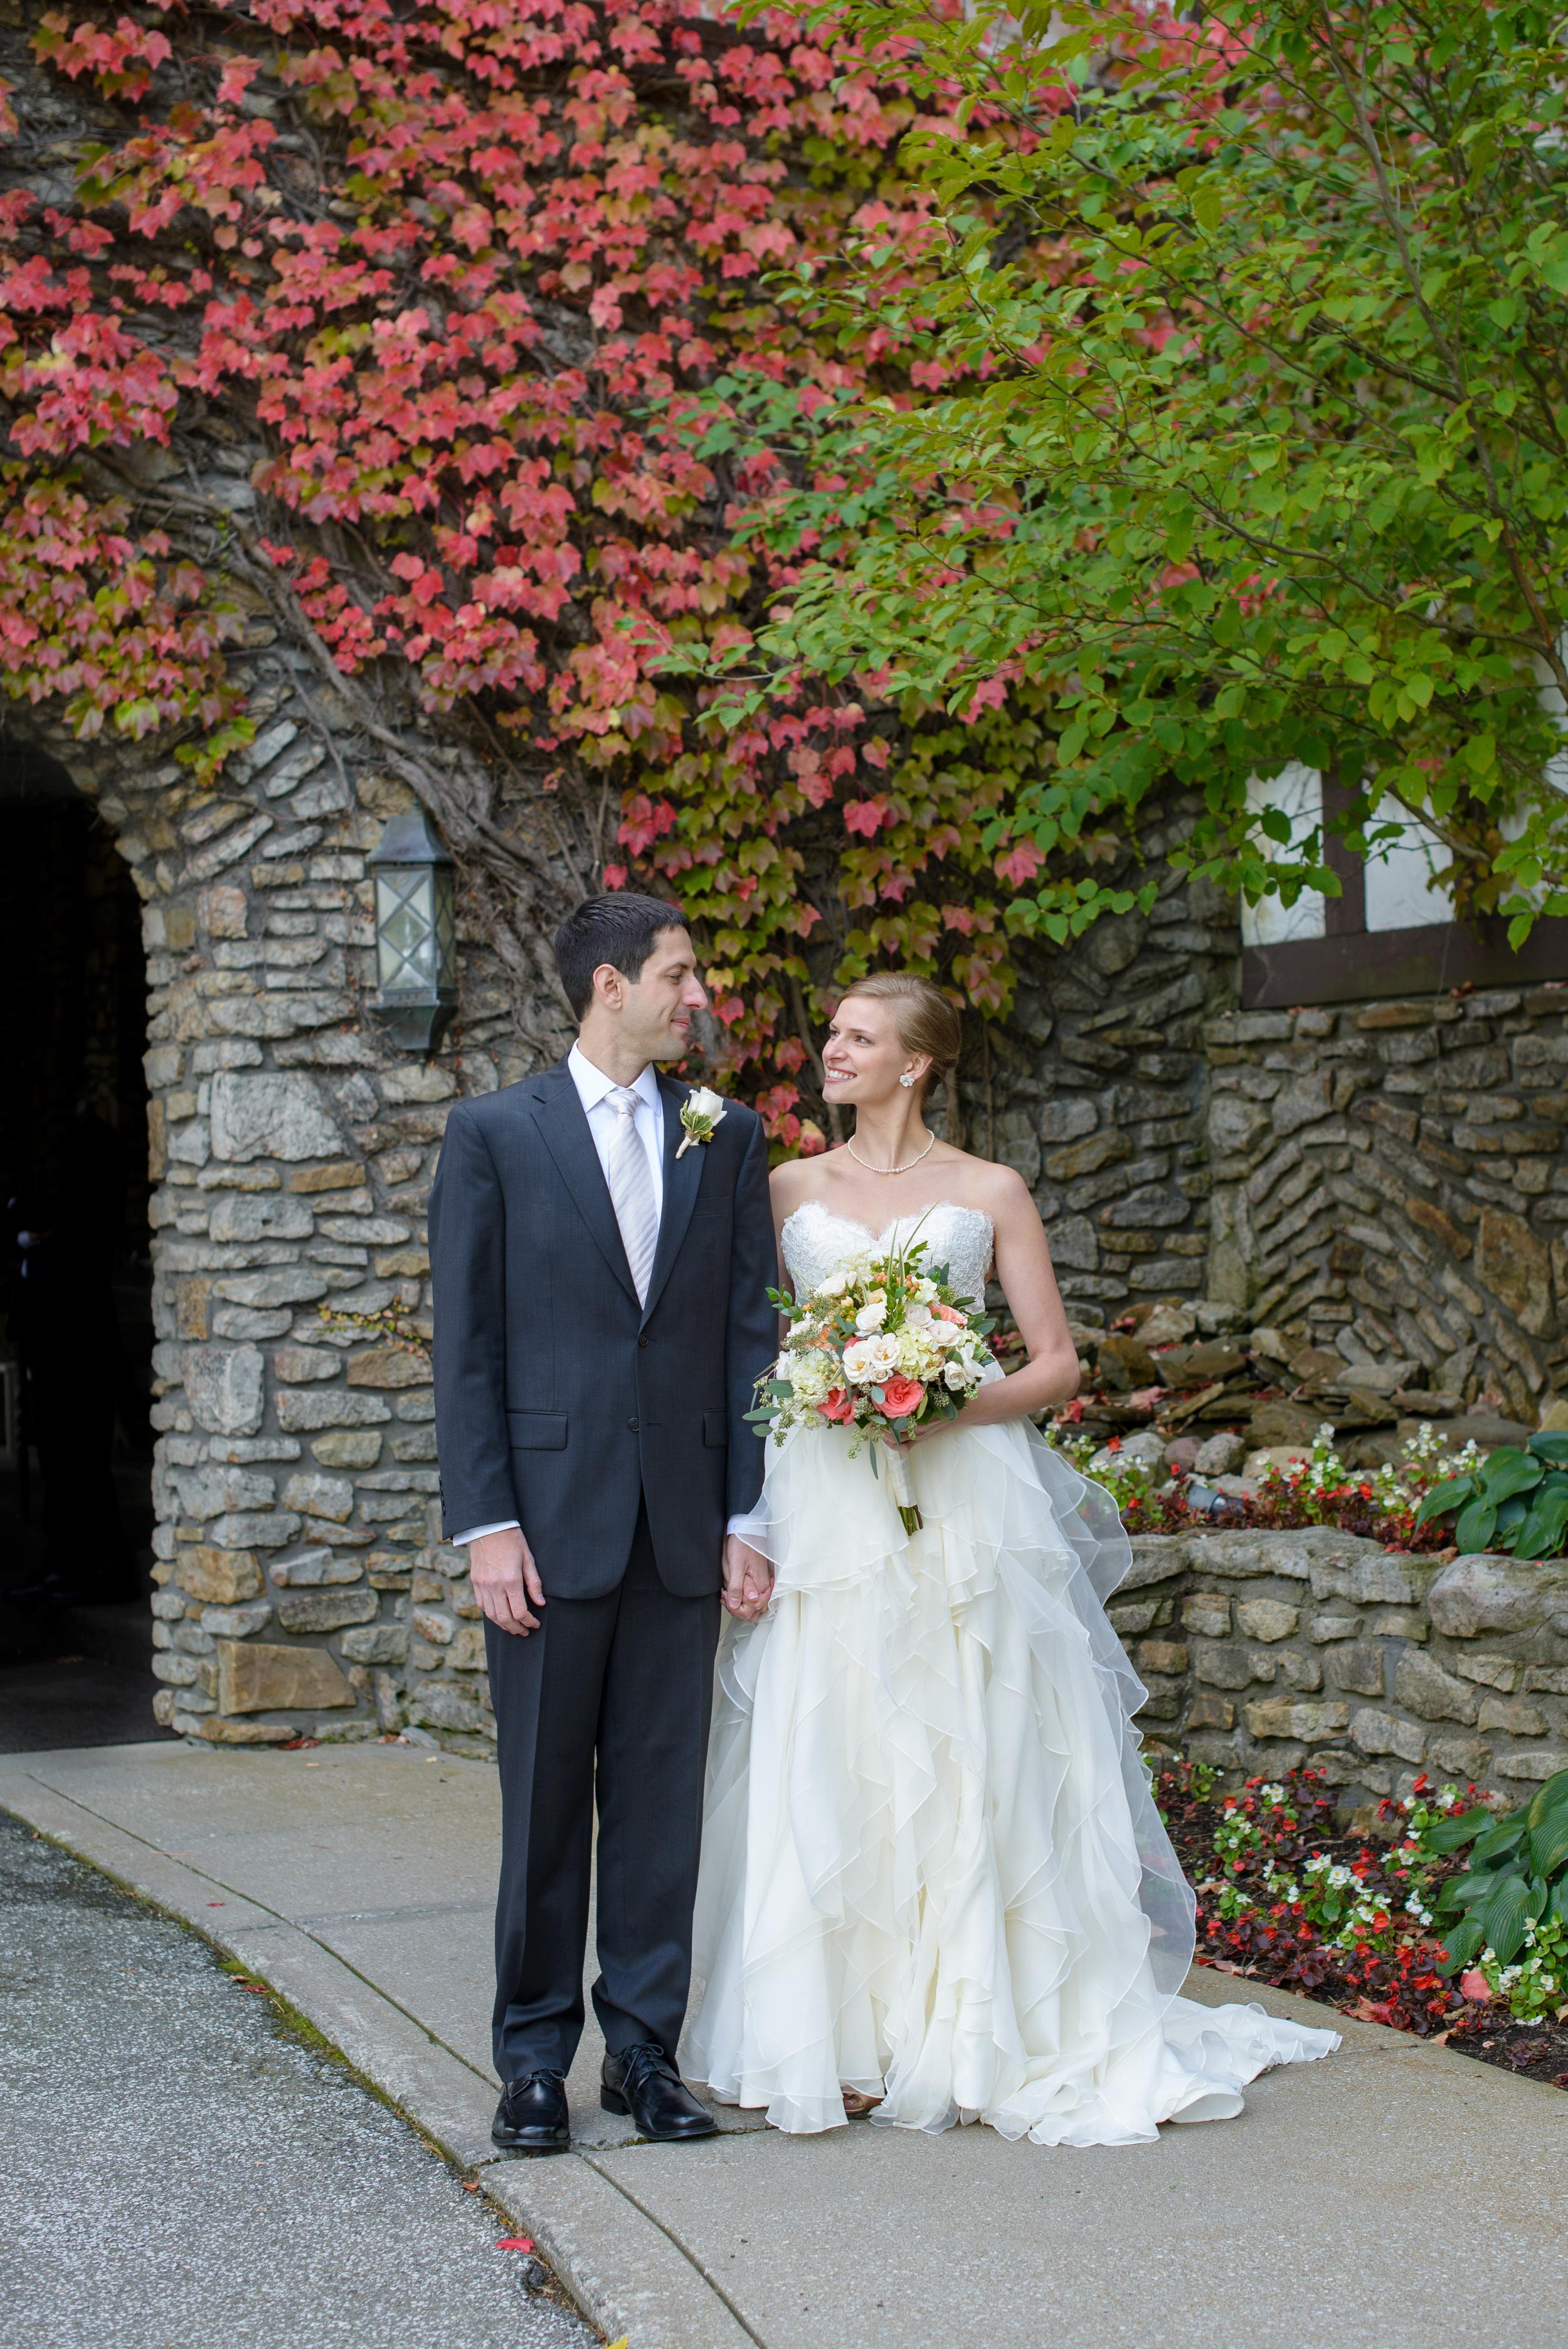 Rachel_Steve_Rustic_Wedding_10.jpg